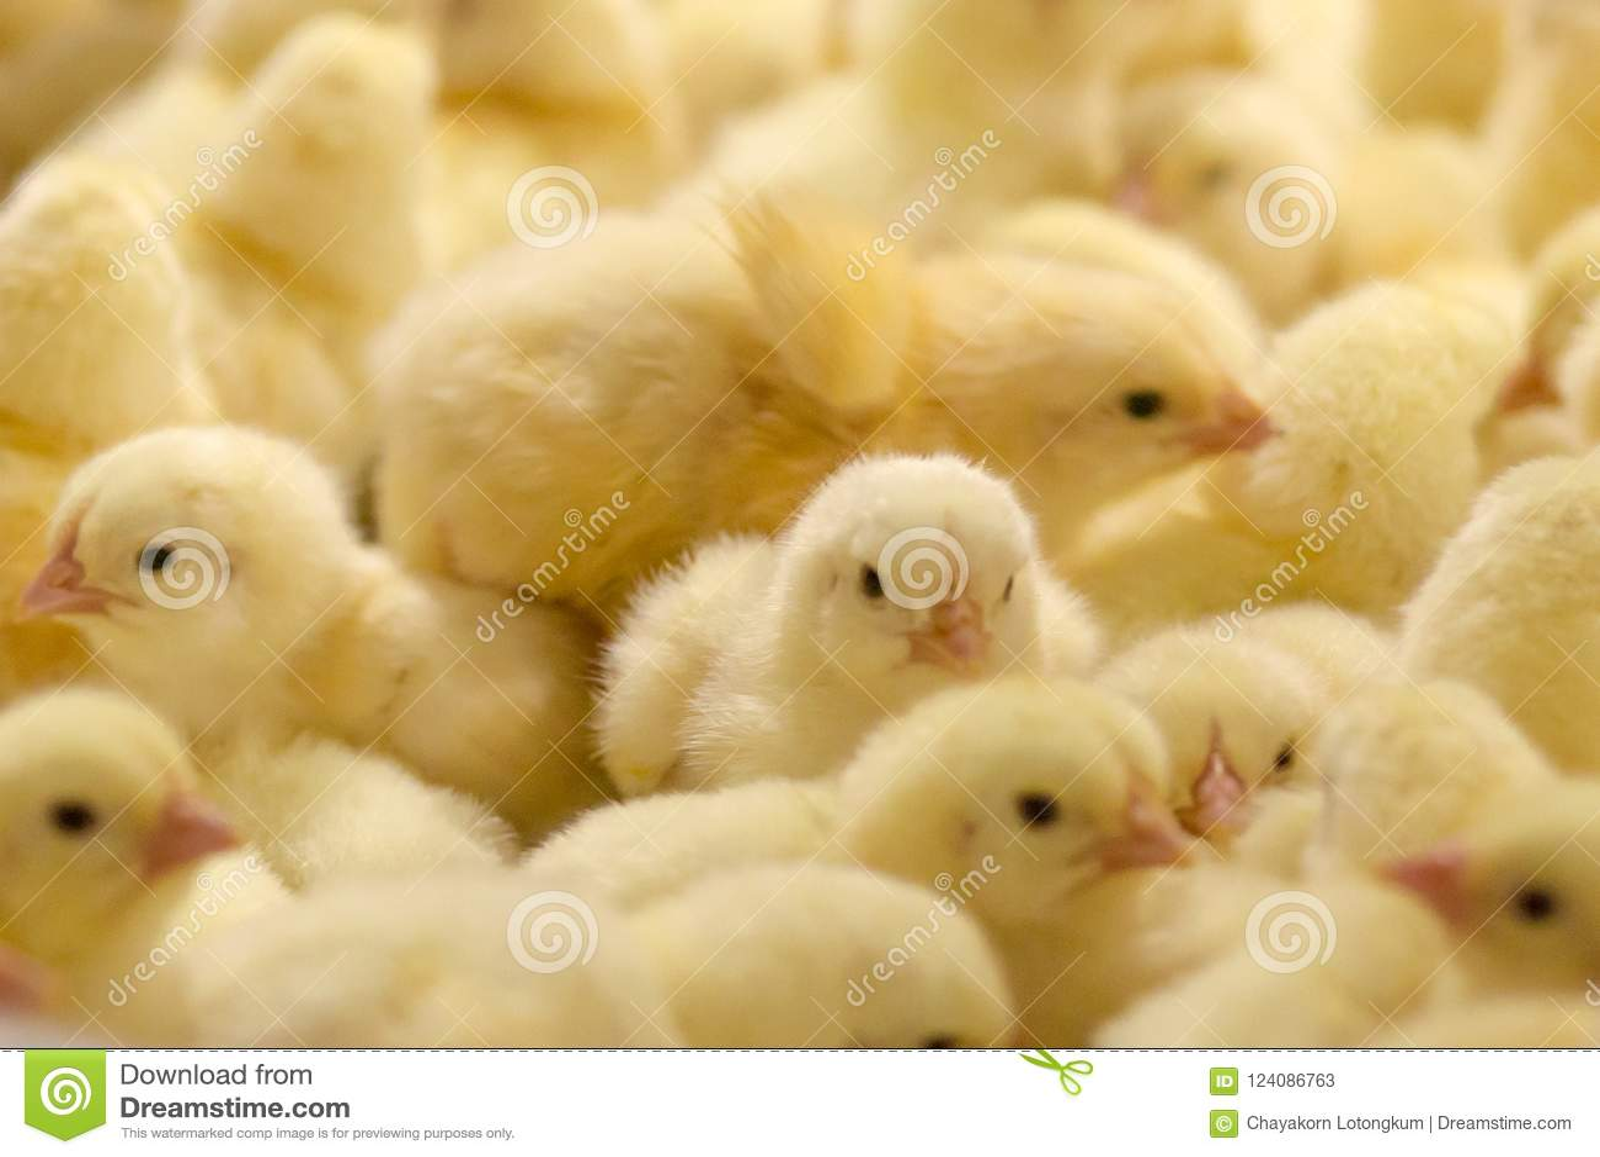 Цыплята младенца как раз принесенные на подносе